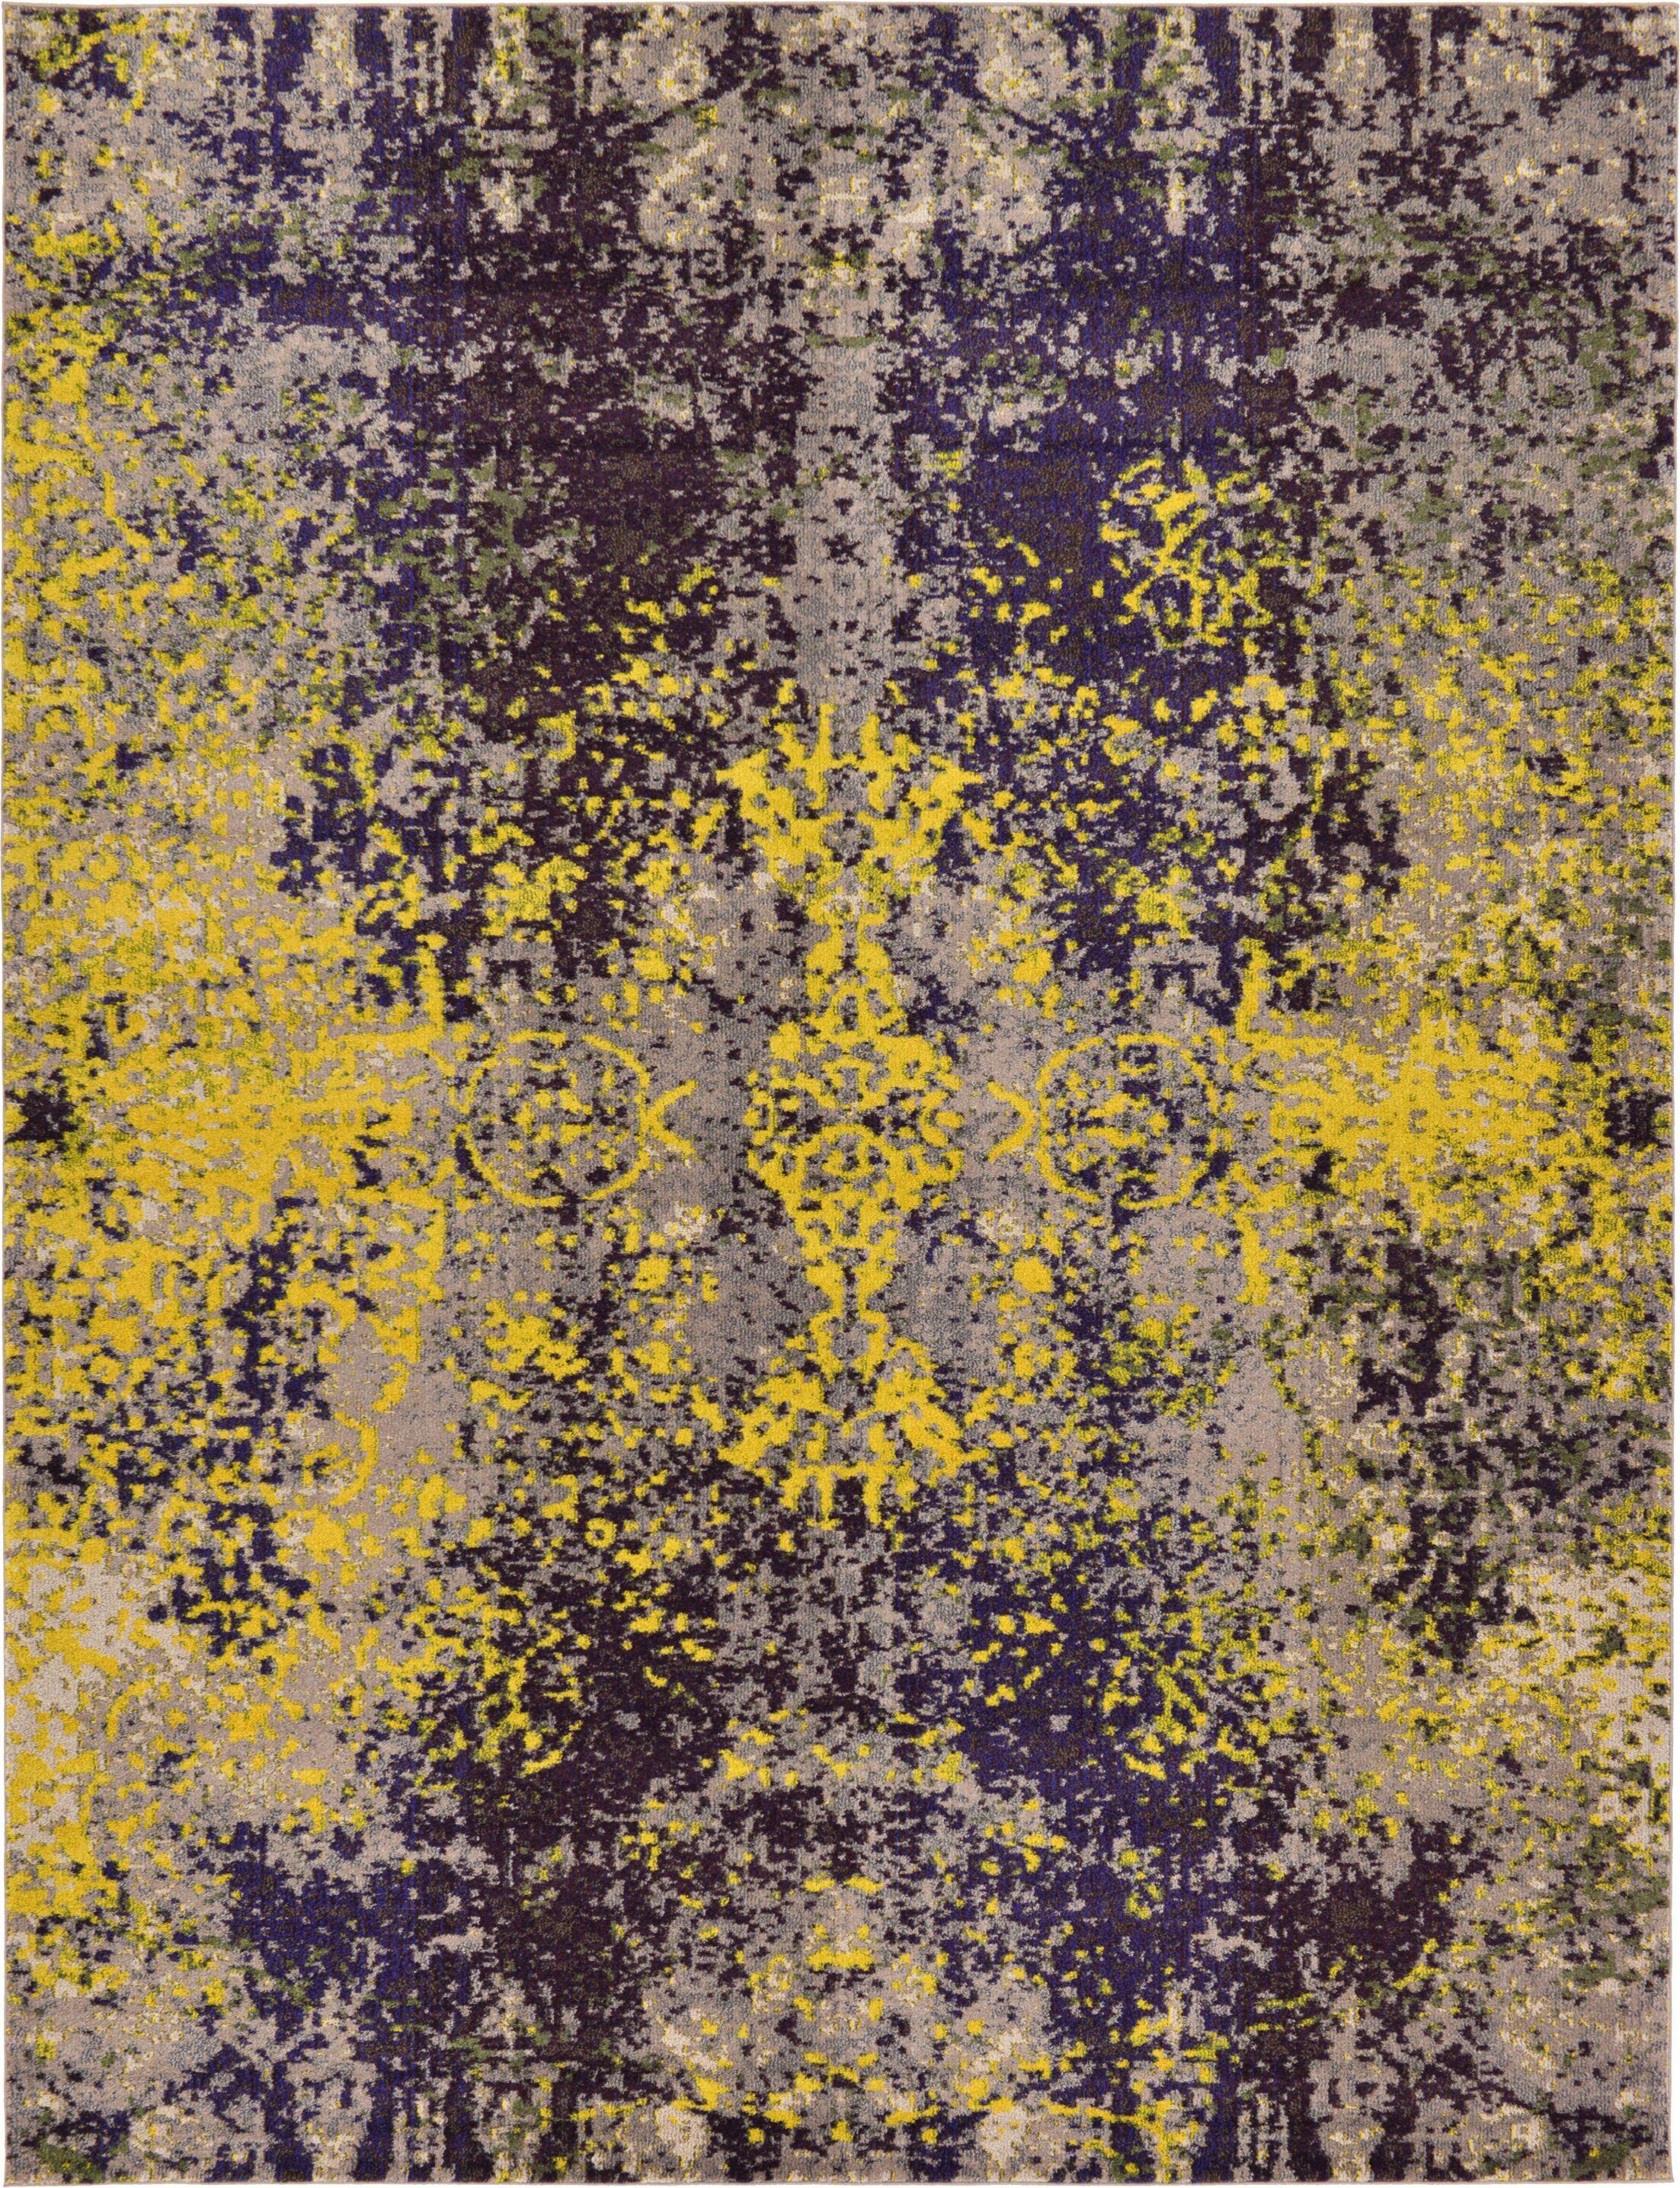 Fujii Gray/Yellow Area Rug Rug Size: Rectangle 9' x 12'